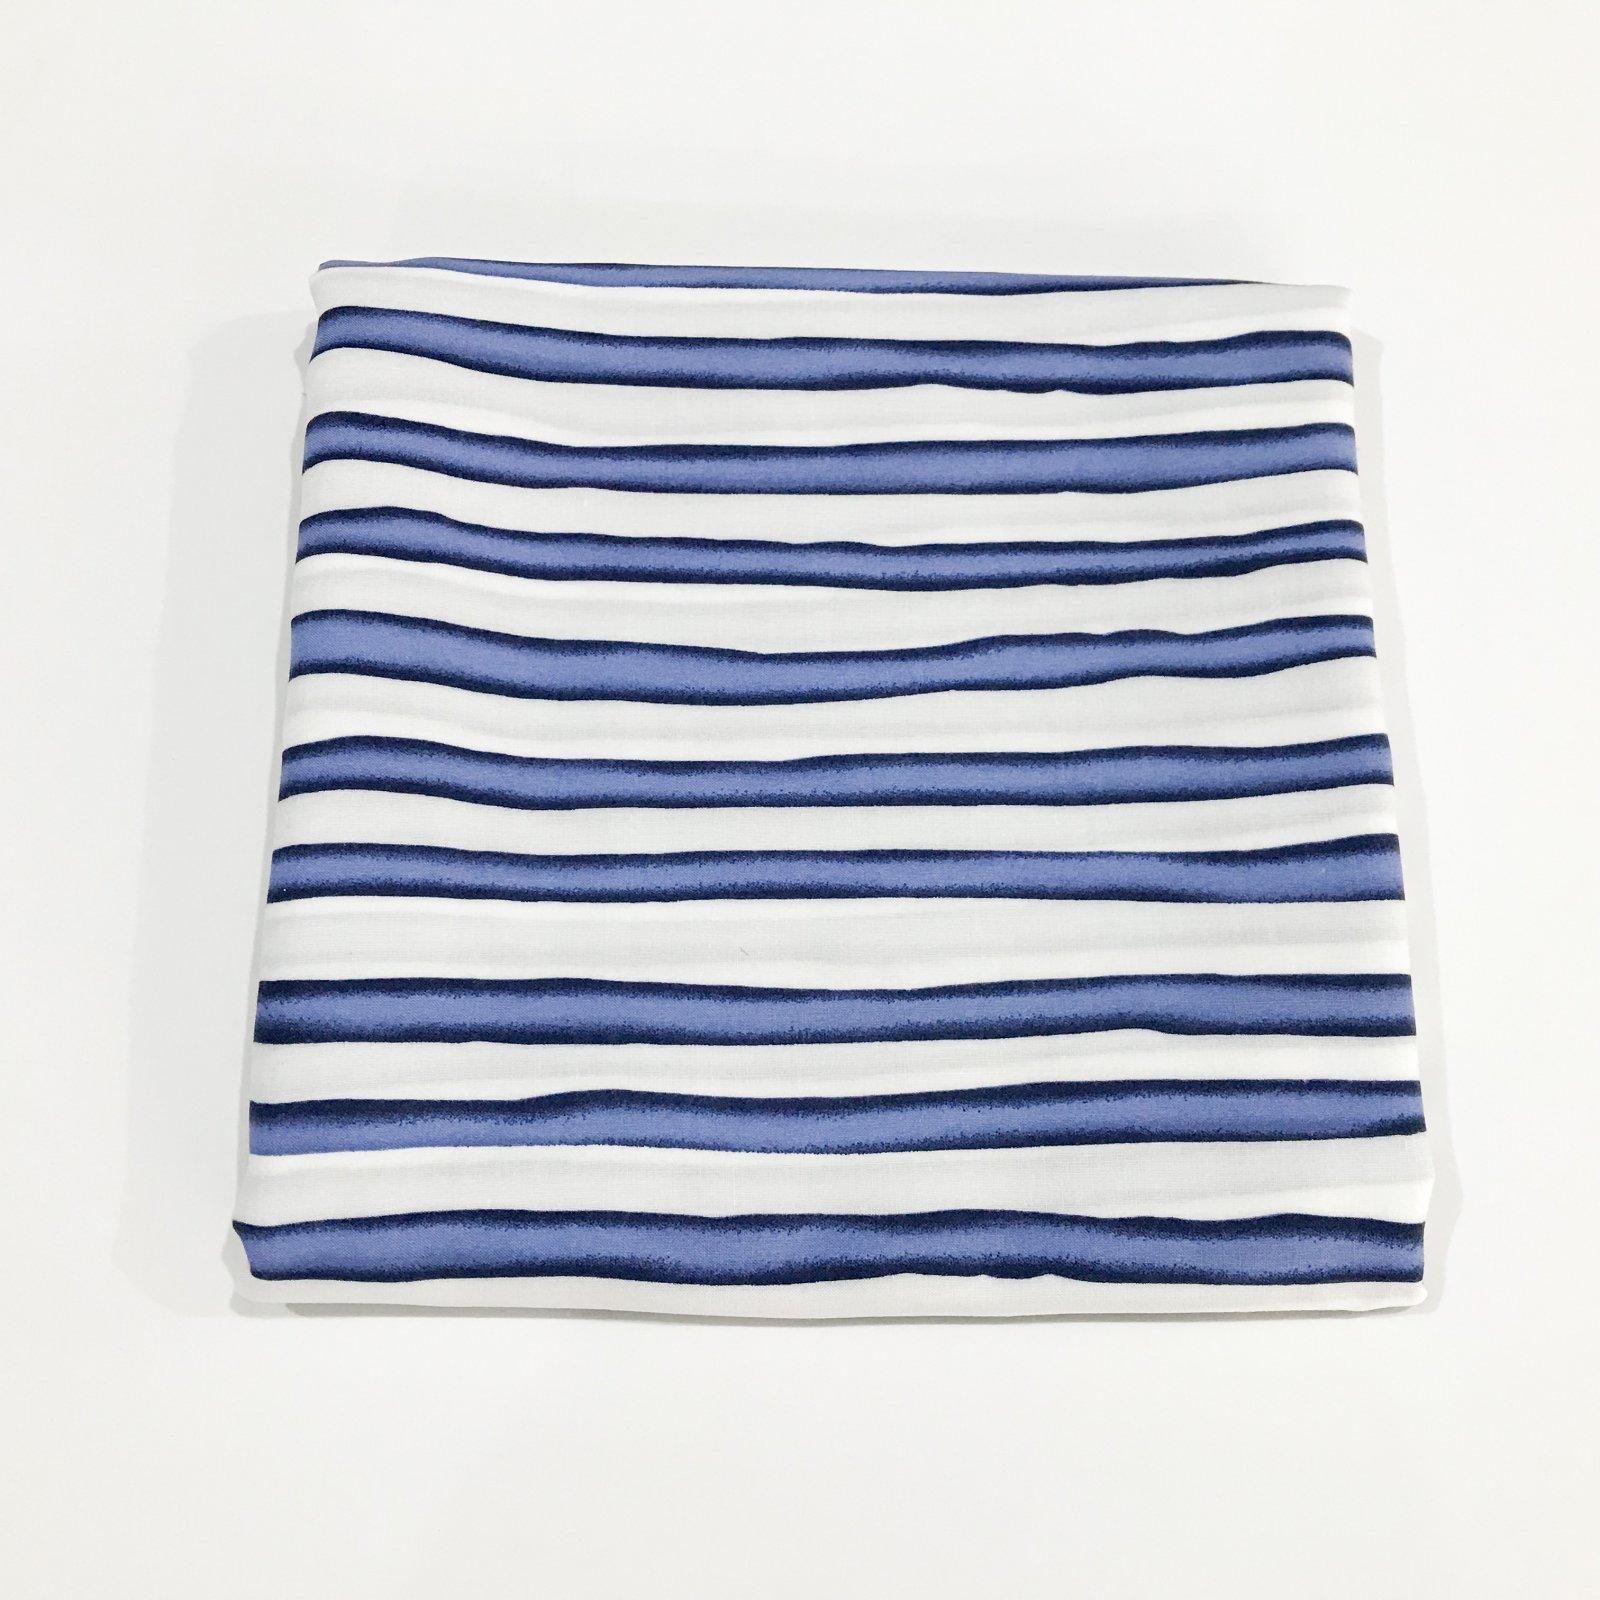 2 yards - Rayon Blue and White Wavy Stripe Challis